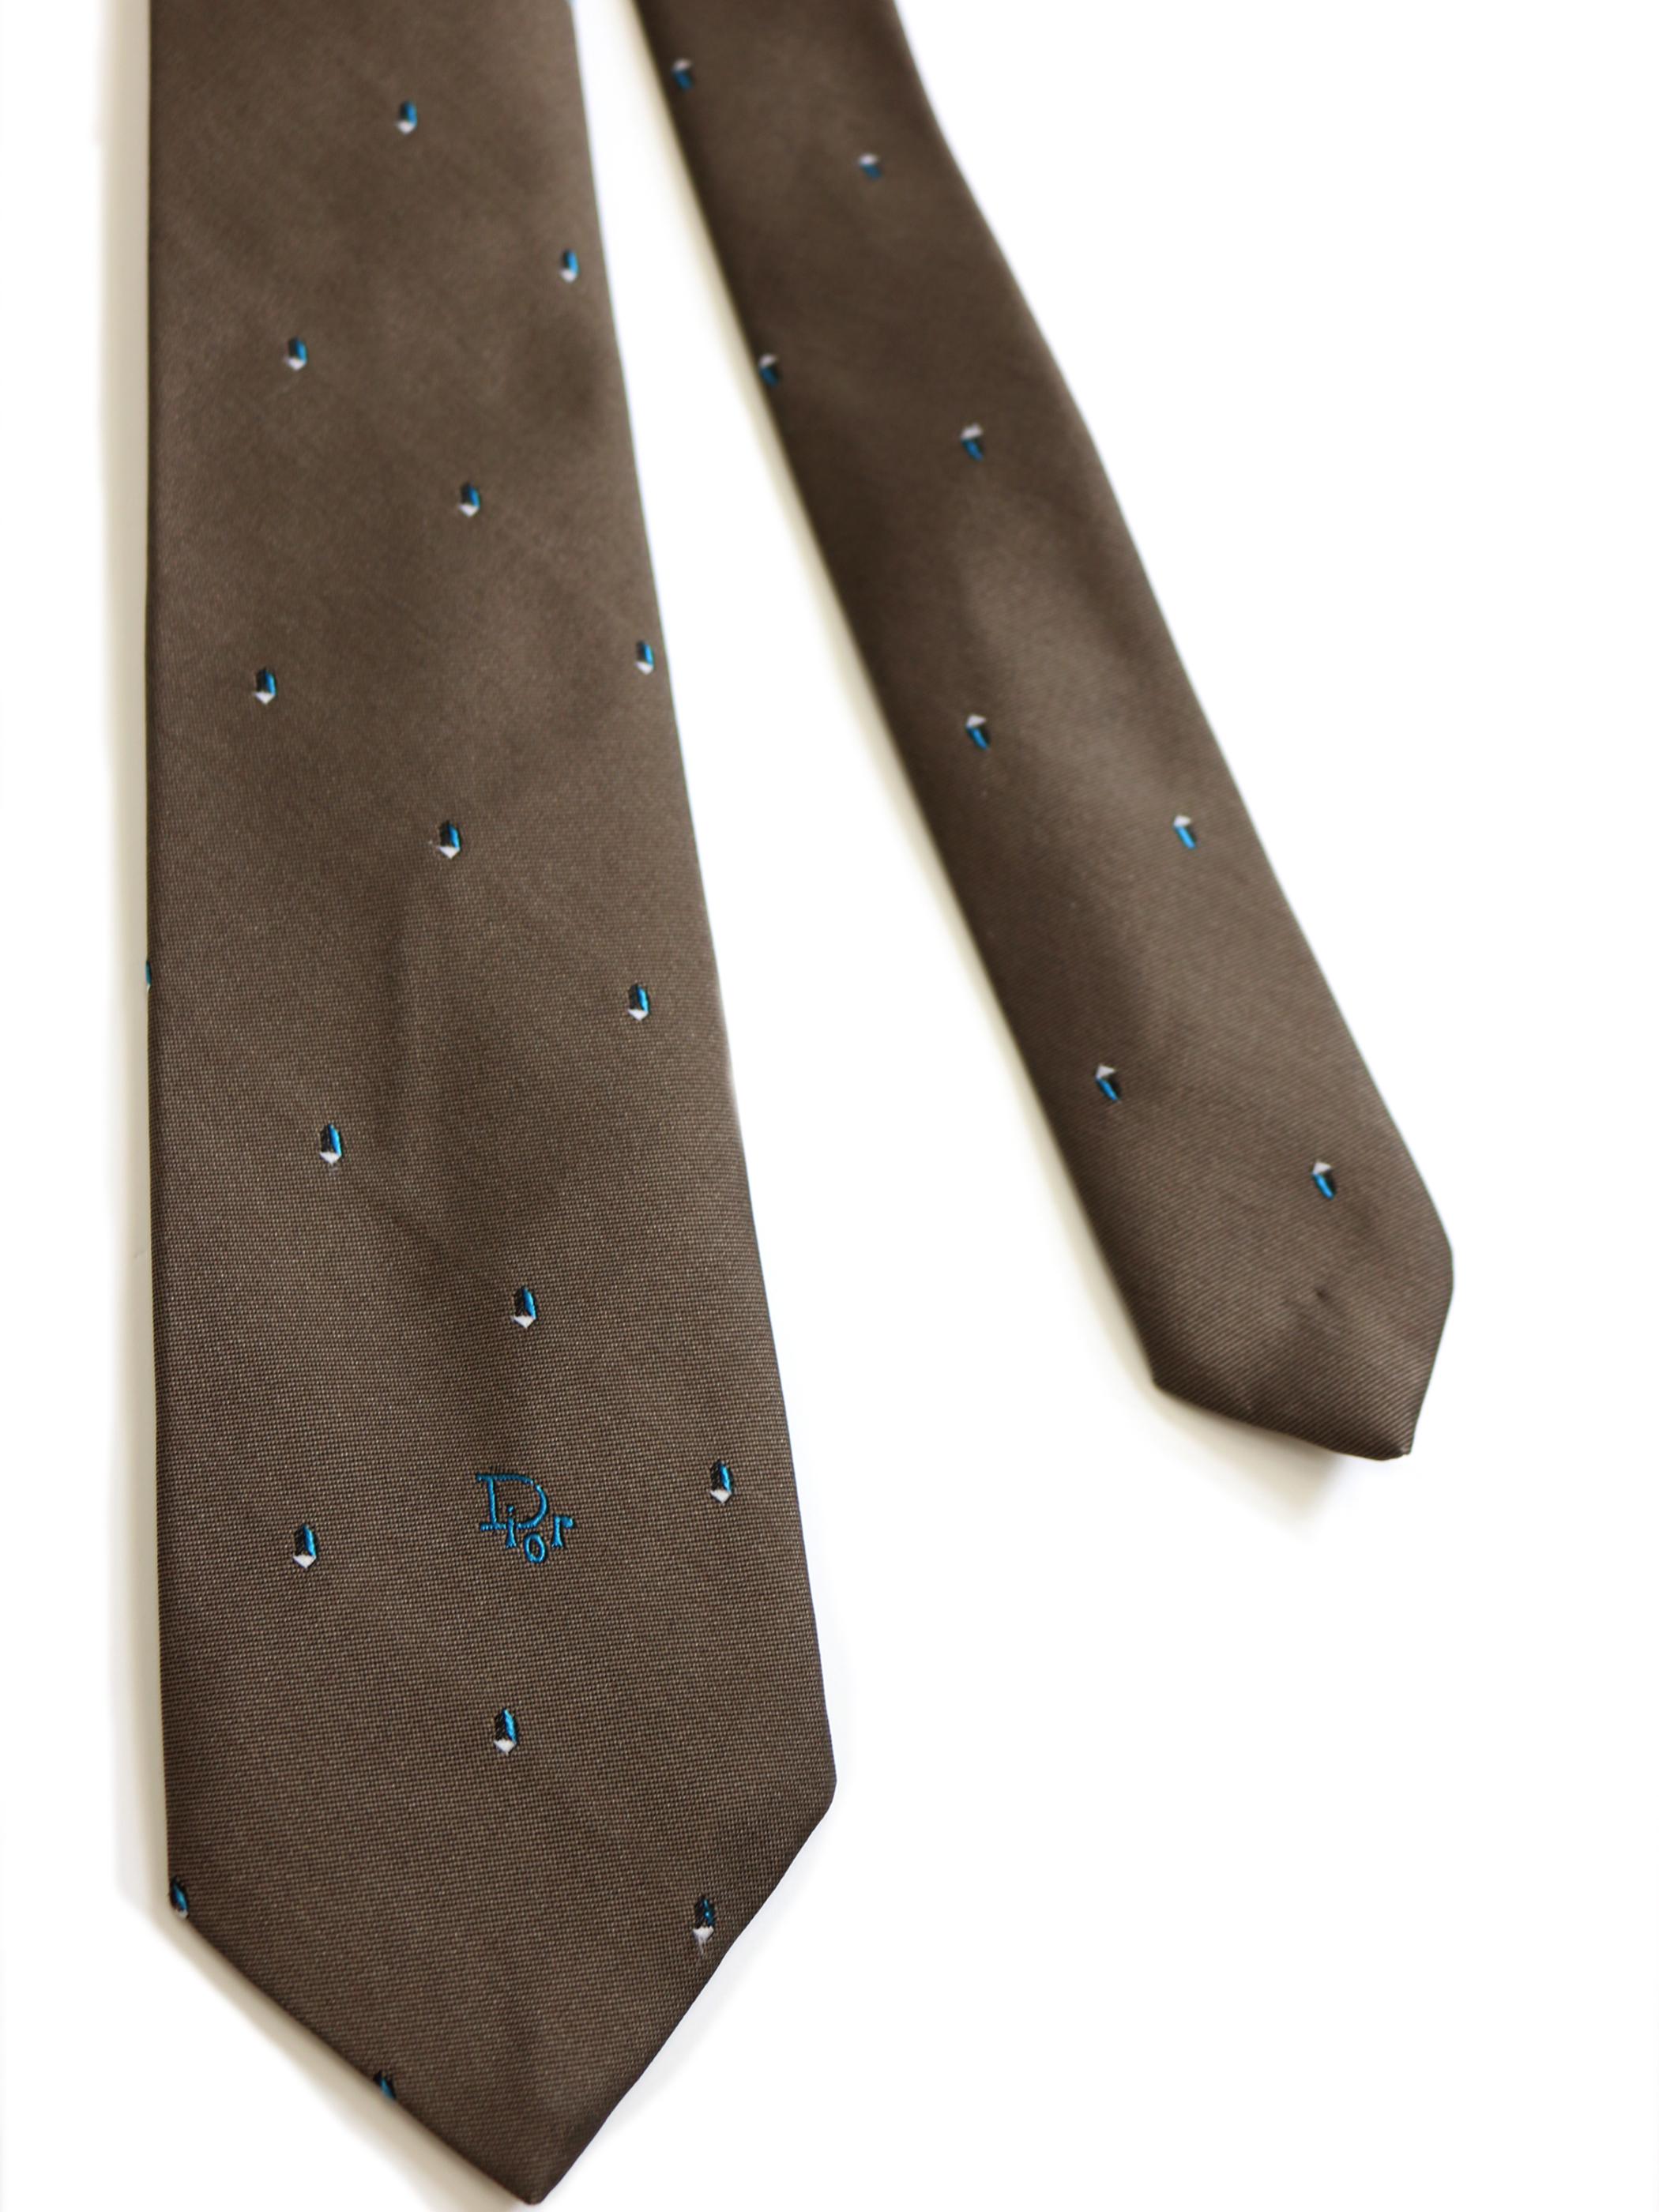 Vintage Christian Dior Tie